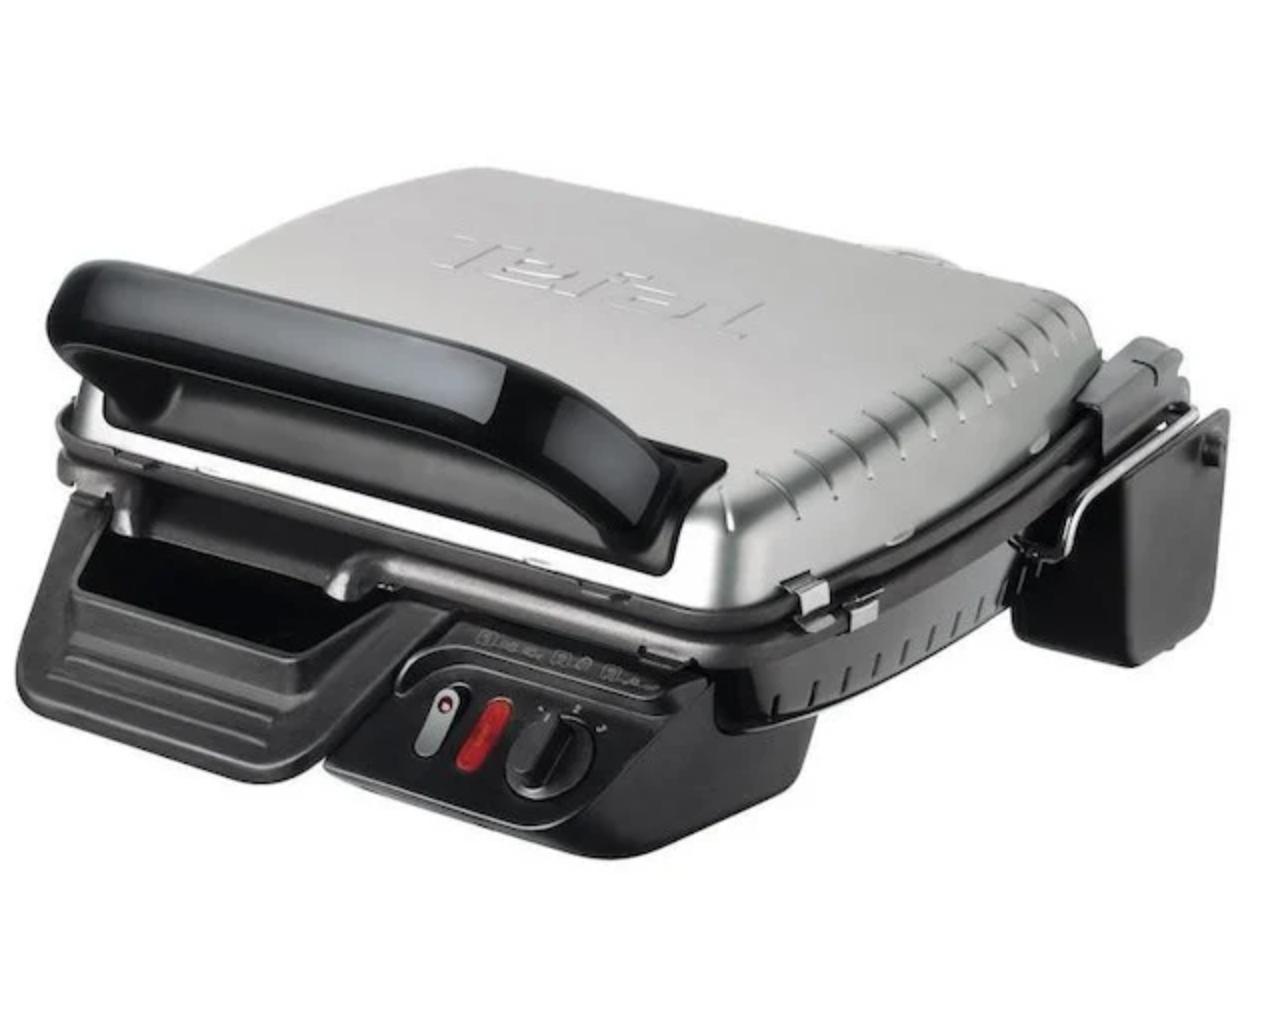 Tefal Ultra Compact Classic GC3050